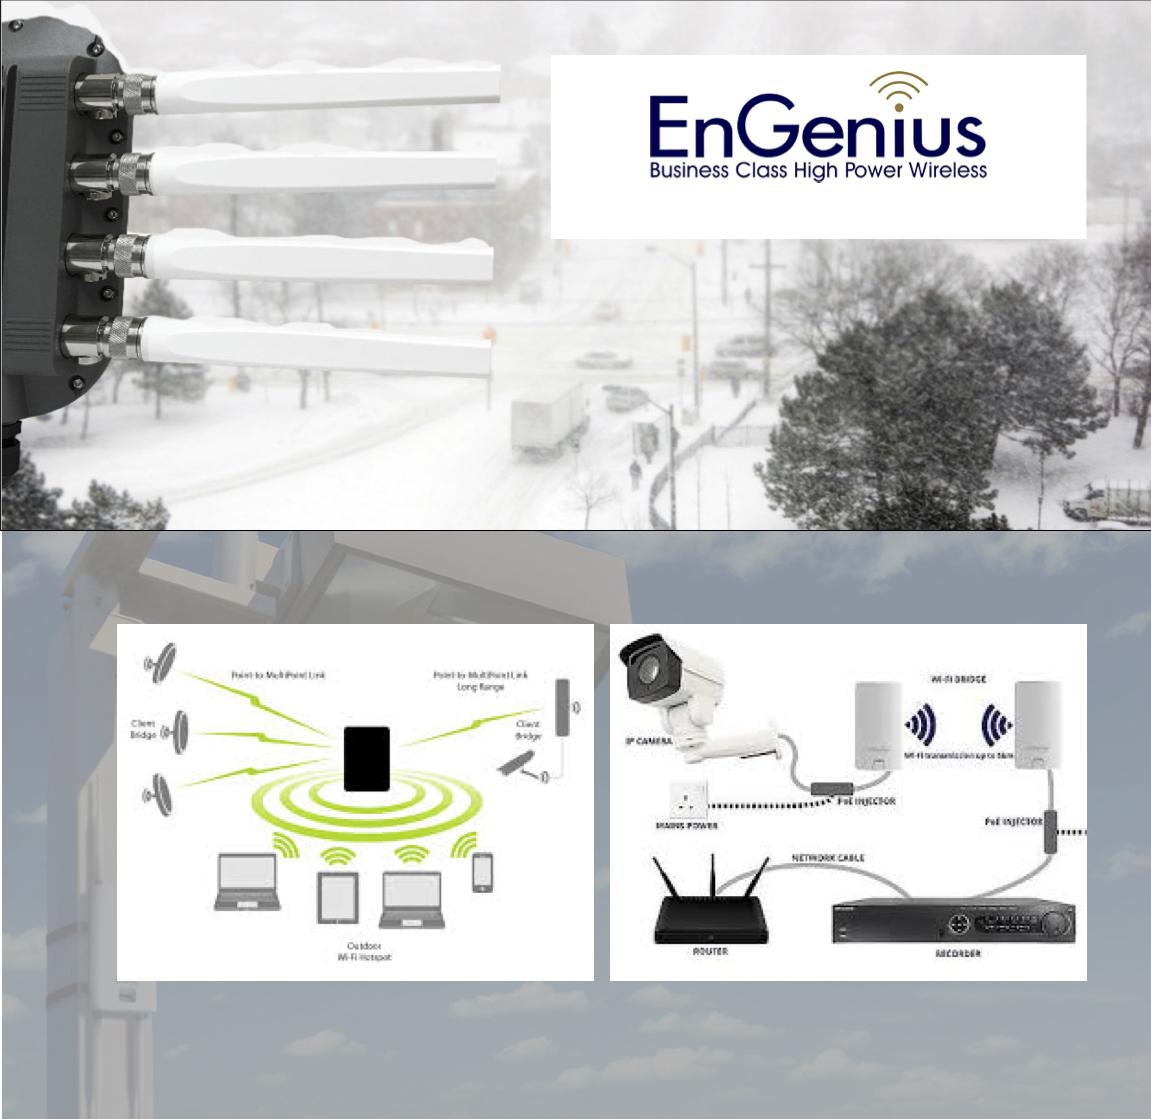 engenious-banner.jpg